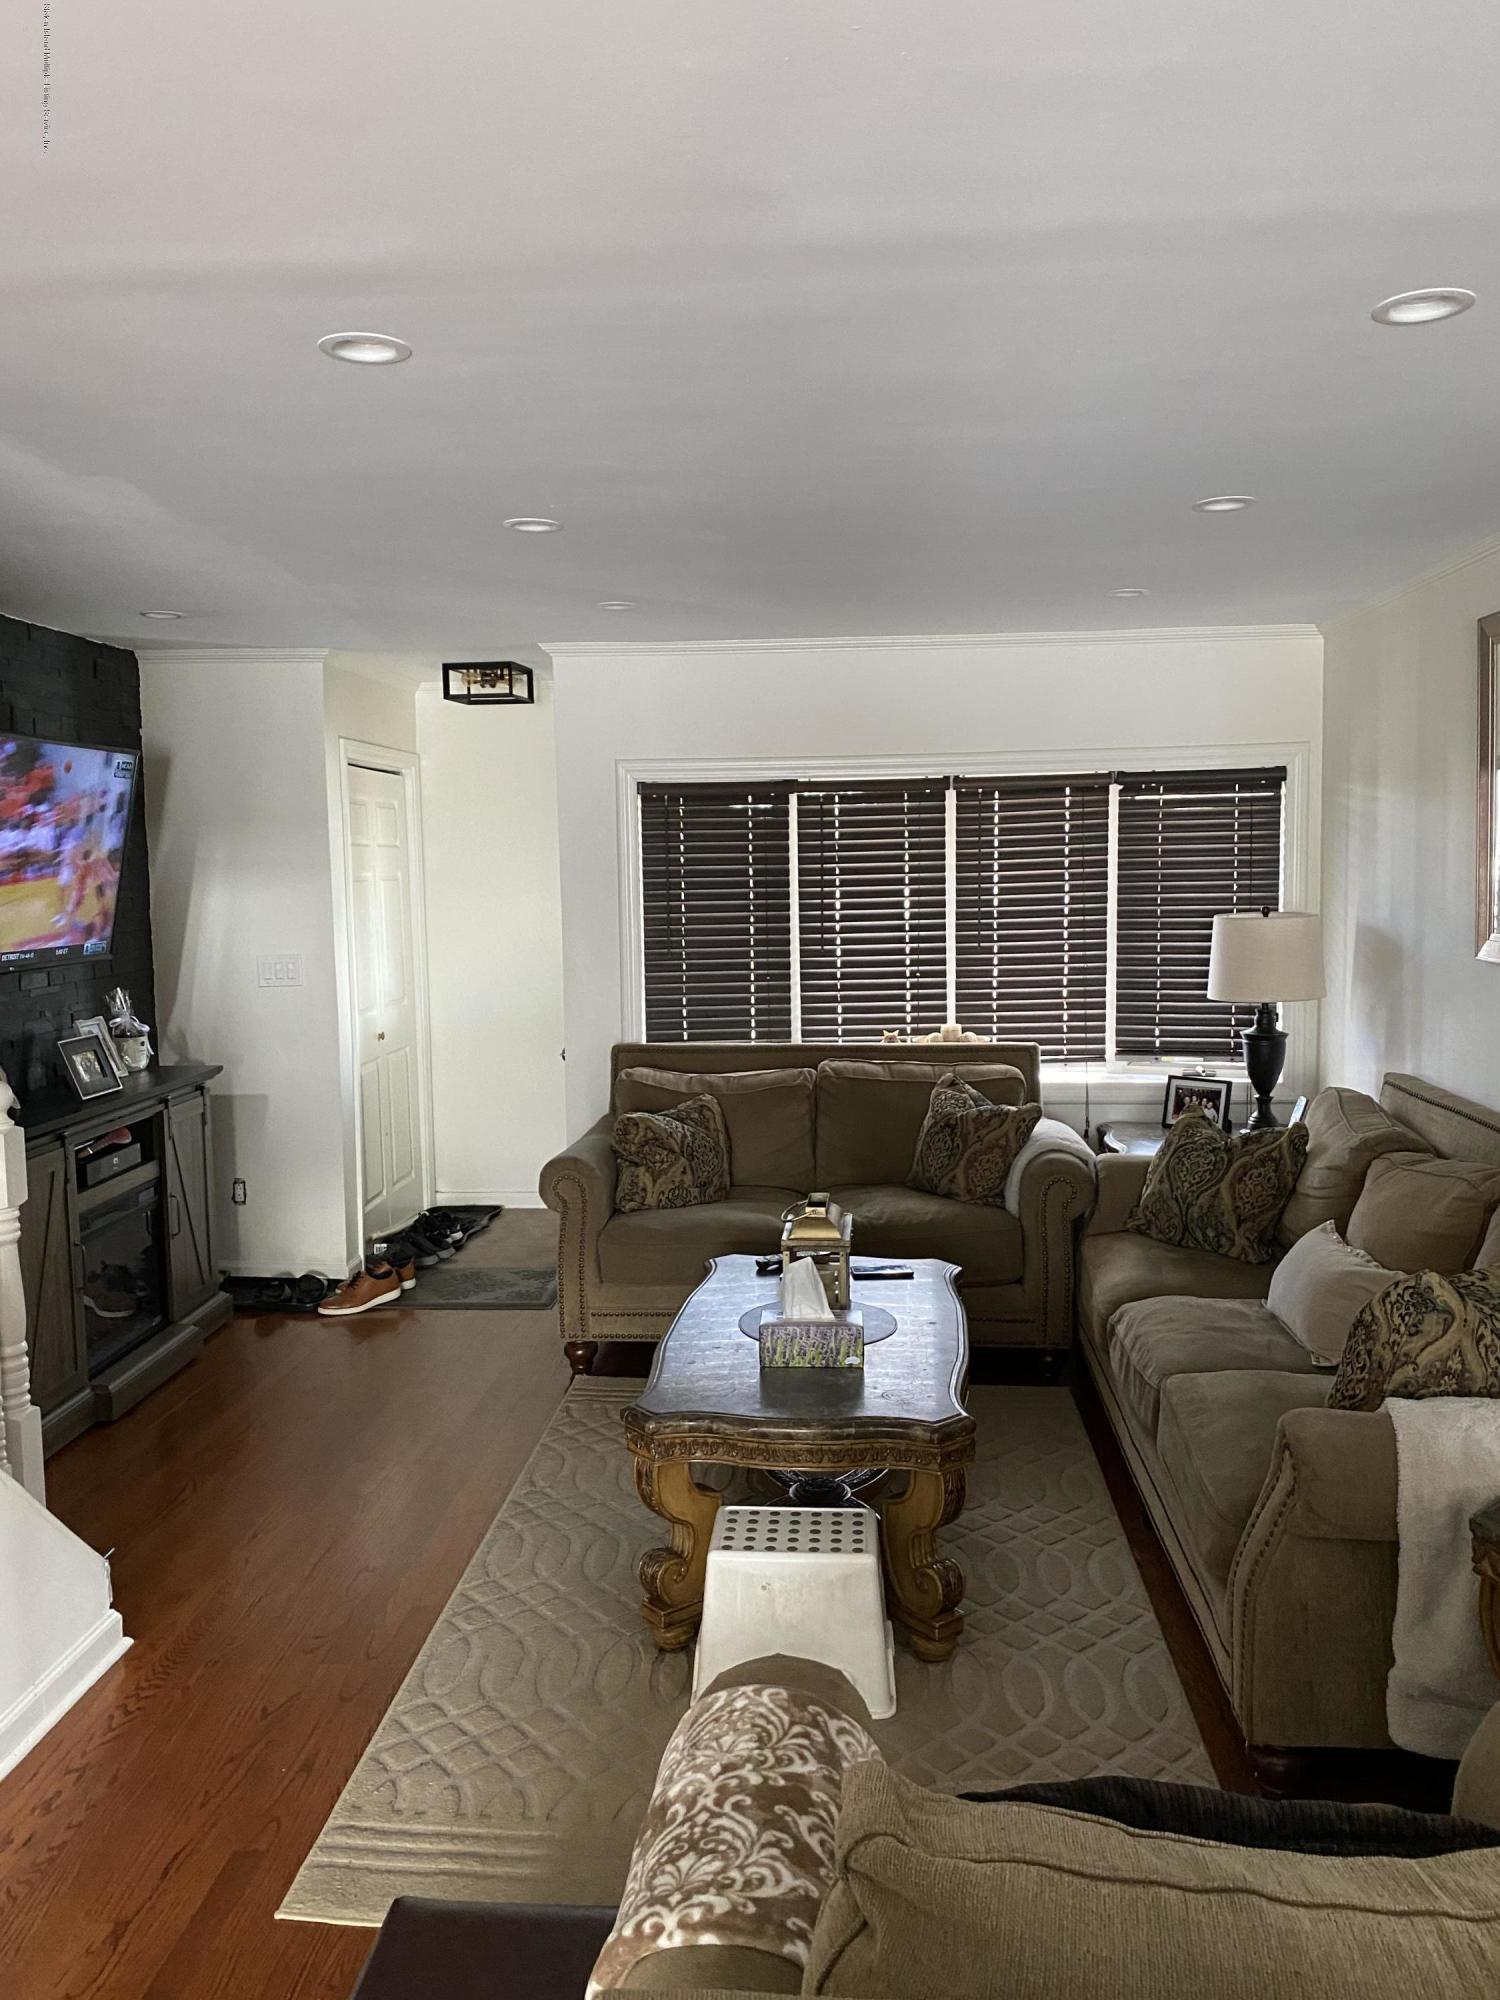 Single Family - Semi-Attached 370 Seaver Avenue  Staten Island, NY 10305, MLS-1136339-6